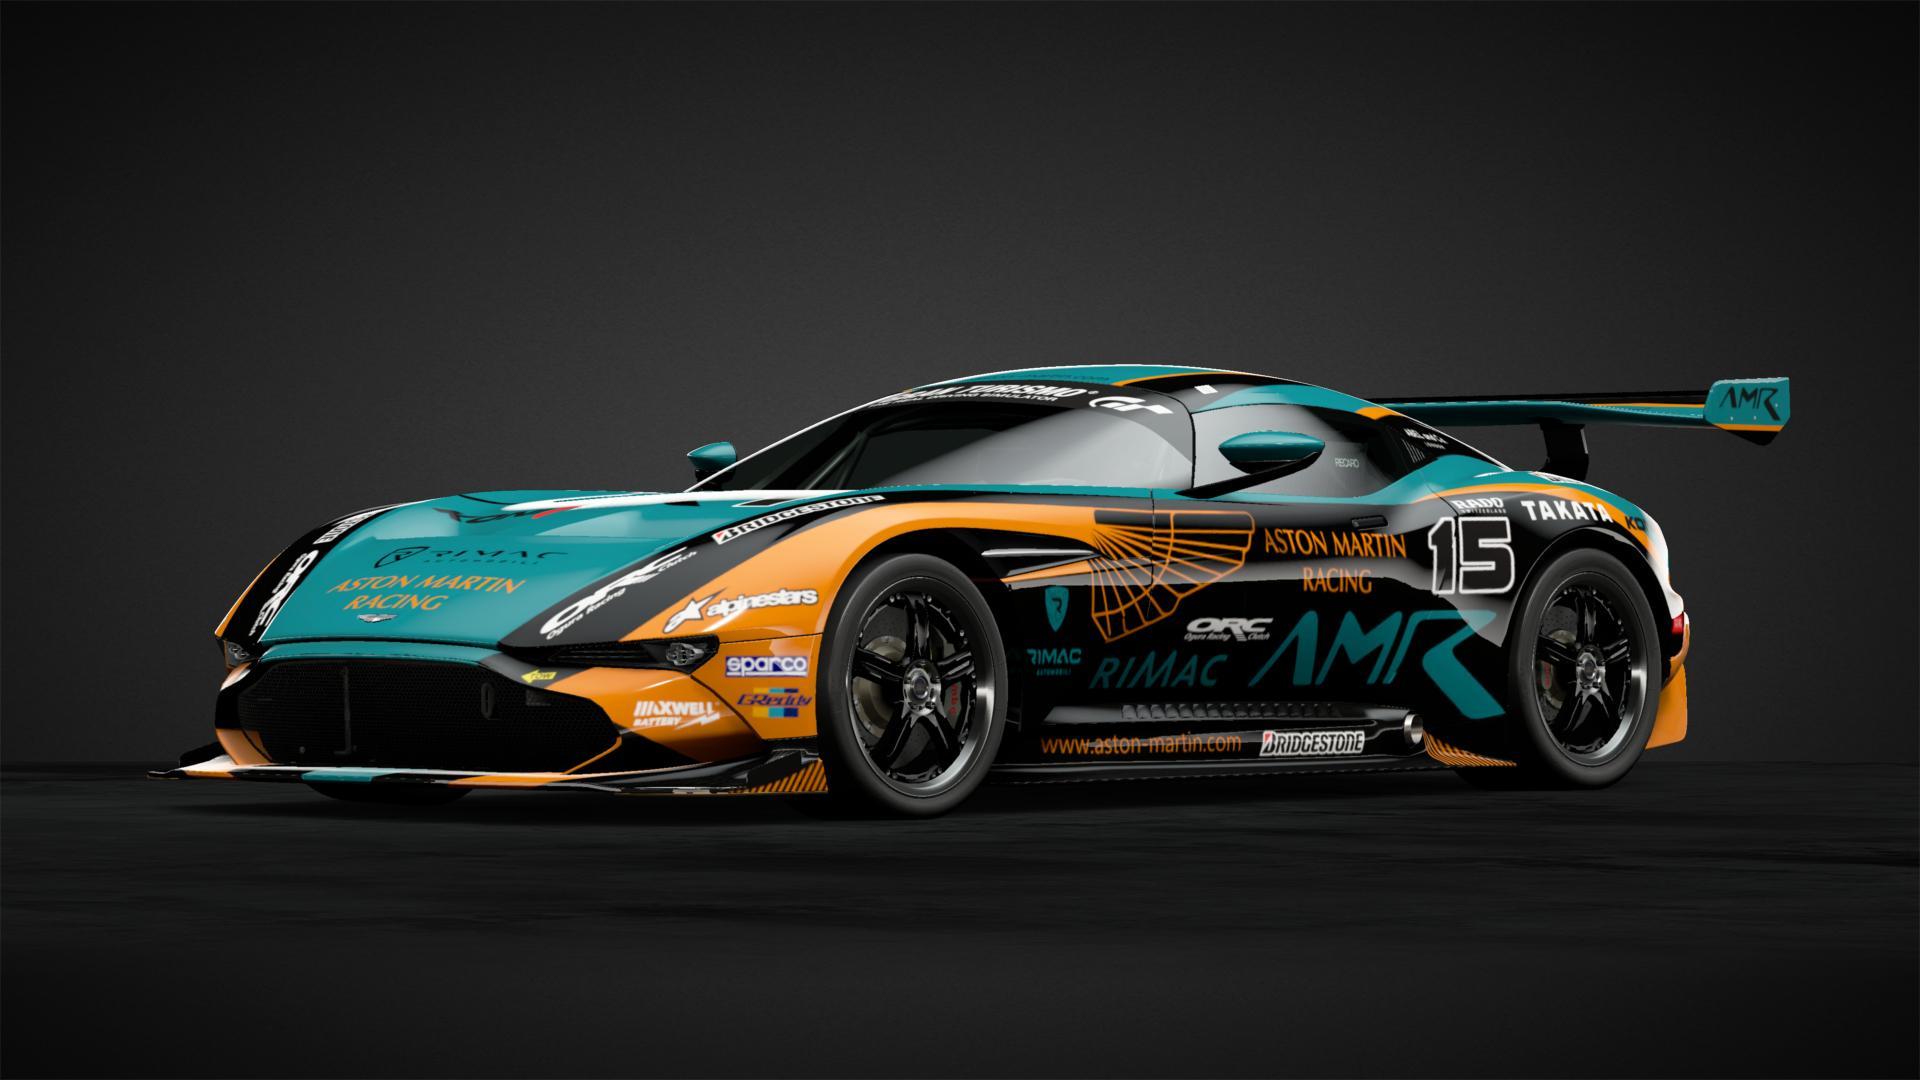 Aston Martin Vulcan Car Livery By Samakorn12 Community Gran Turismo Sport